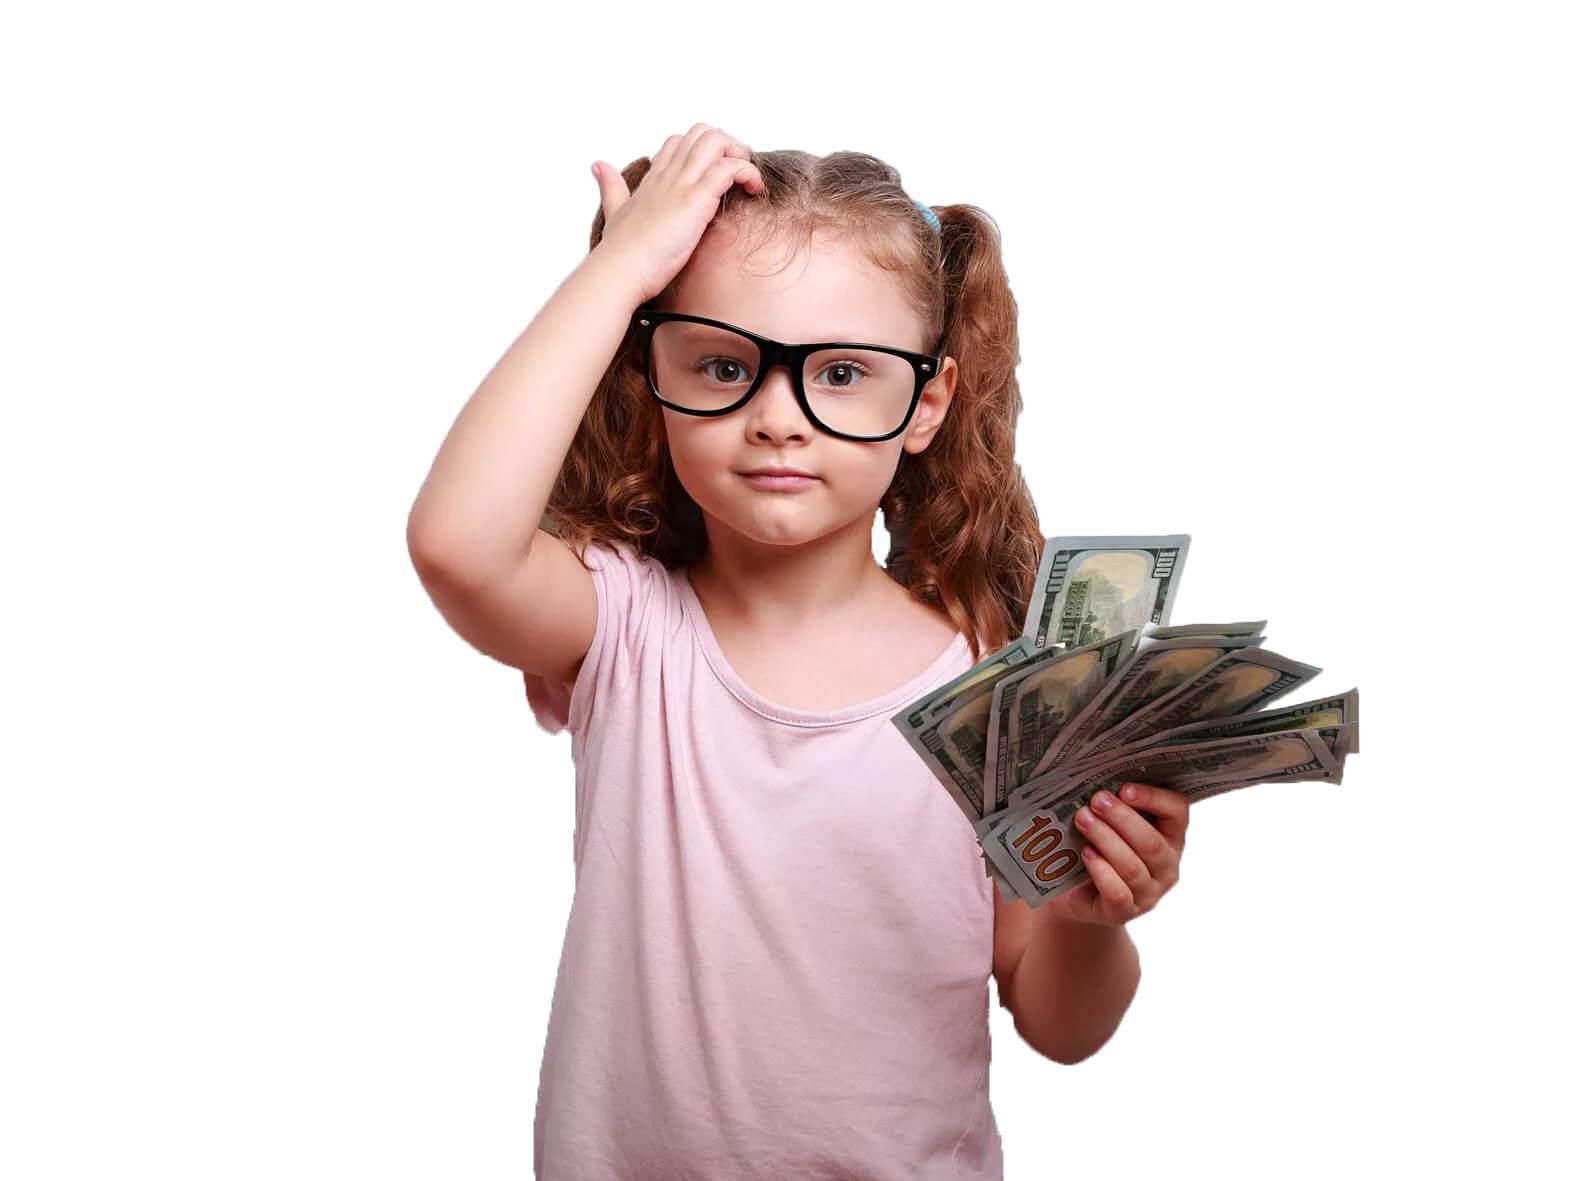 Плюсы и минусы электронных денег. Электронные валюты это..